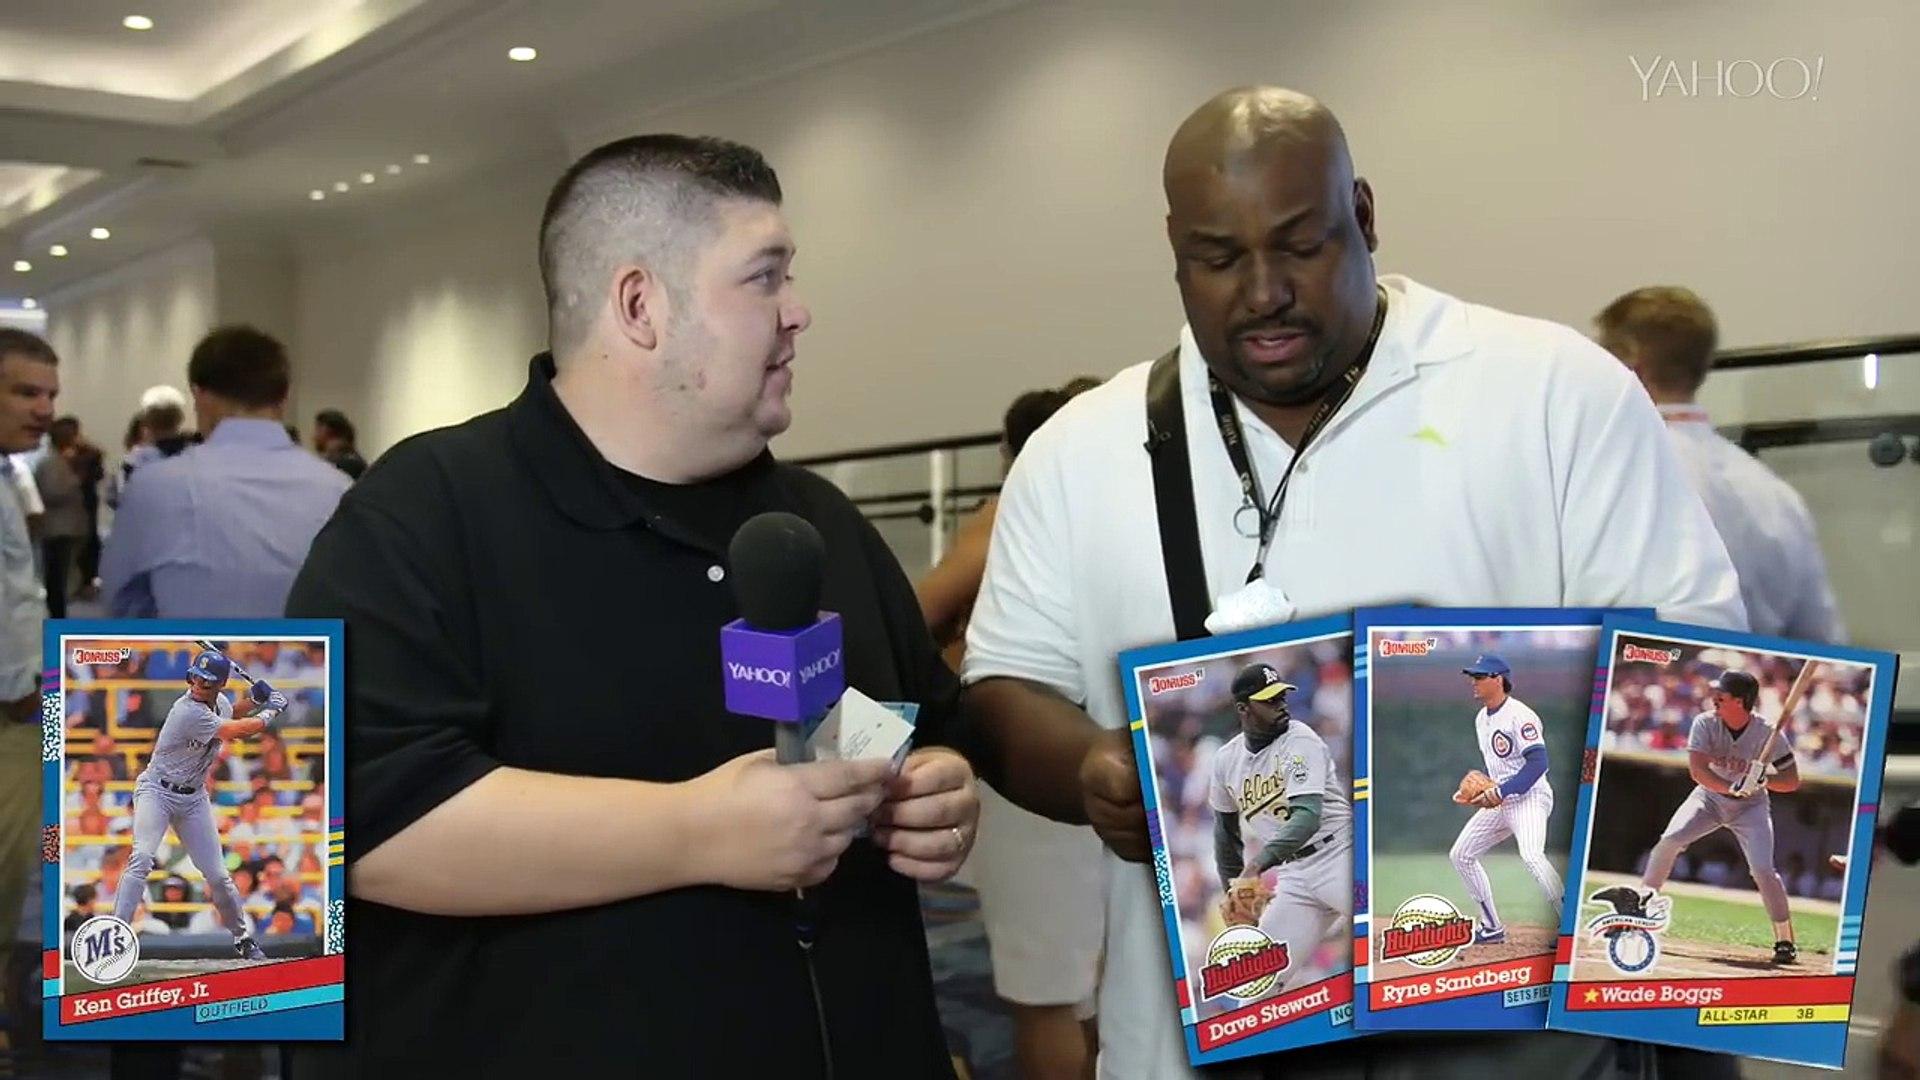 Bobby Bonilla opens 25 year old baseball cards